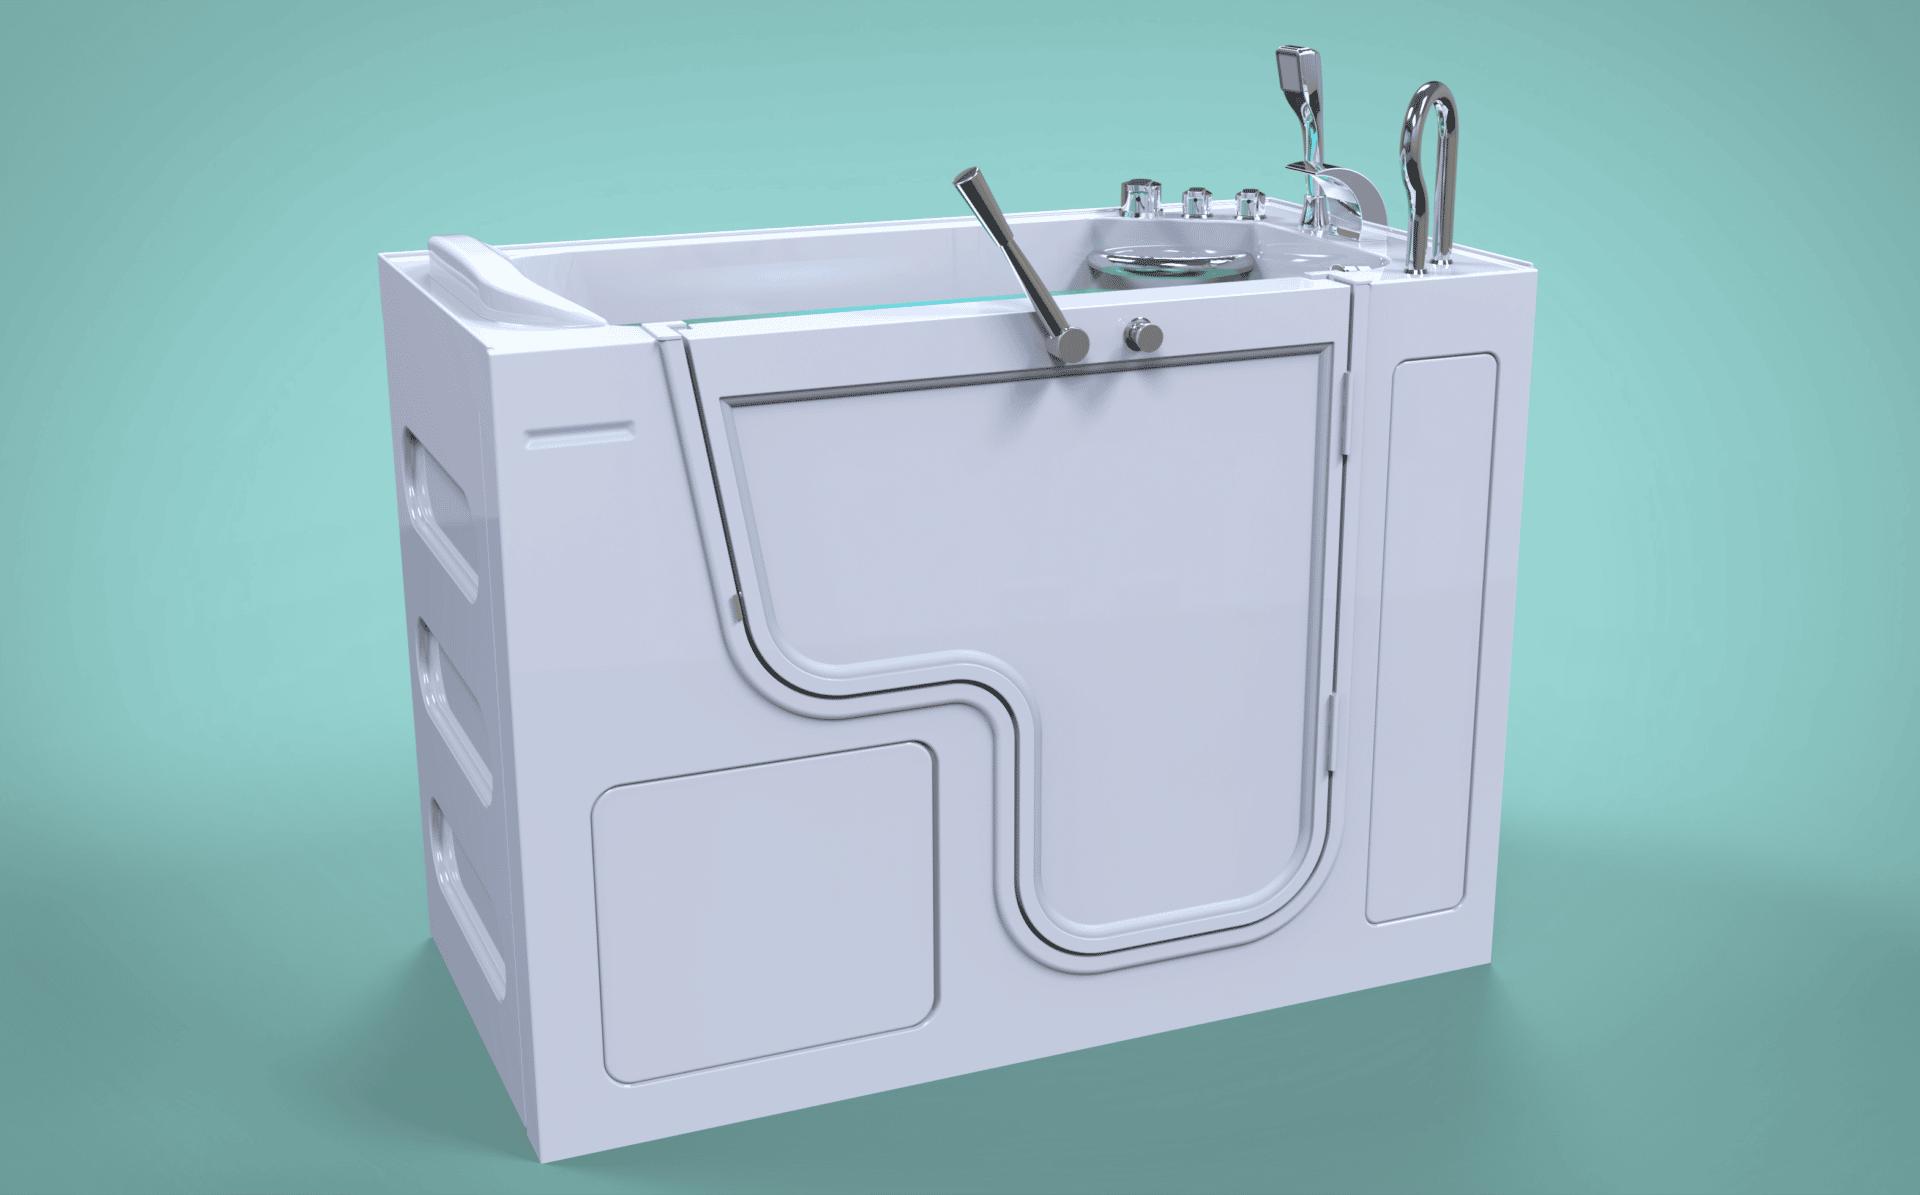 3d model of Panama style walk-in bathtub with door closed